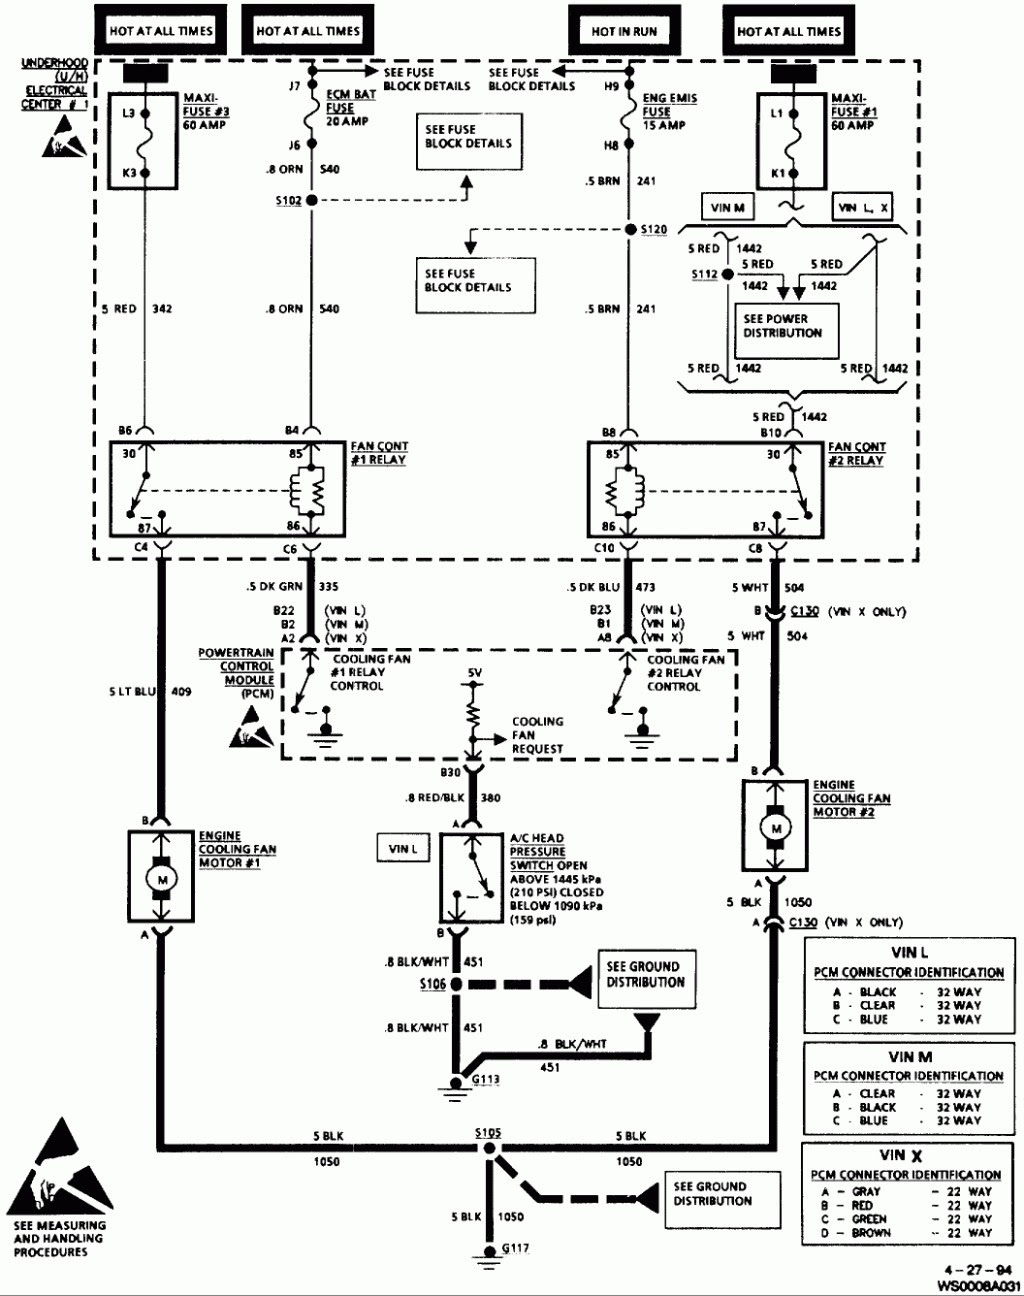 1993 Oldsmobile Cutlas Ciera Wiring Diagram - Wiring ...